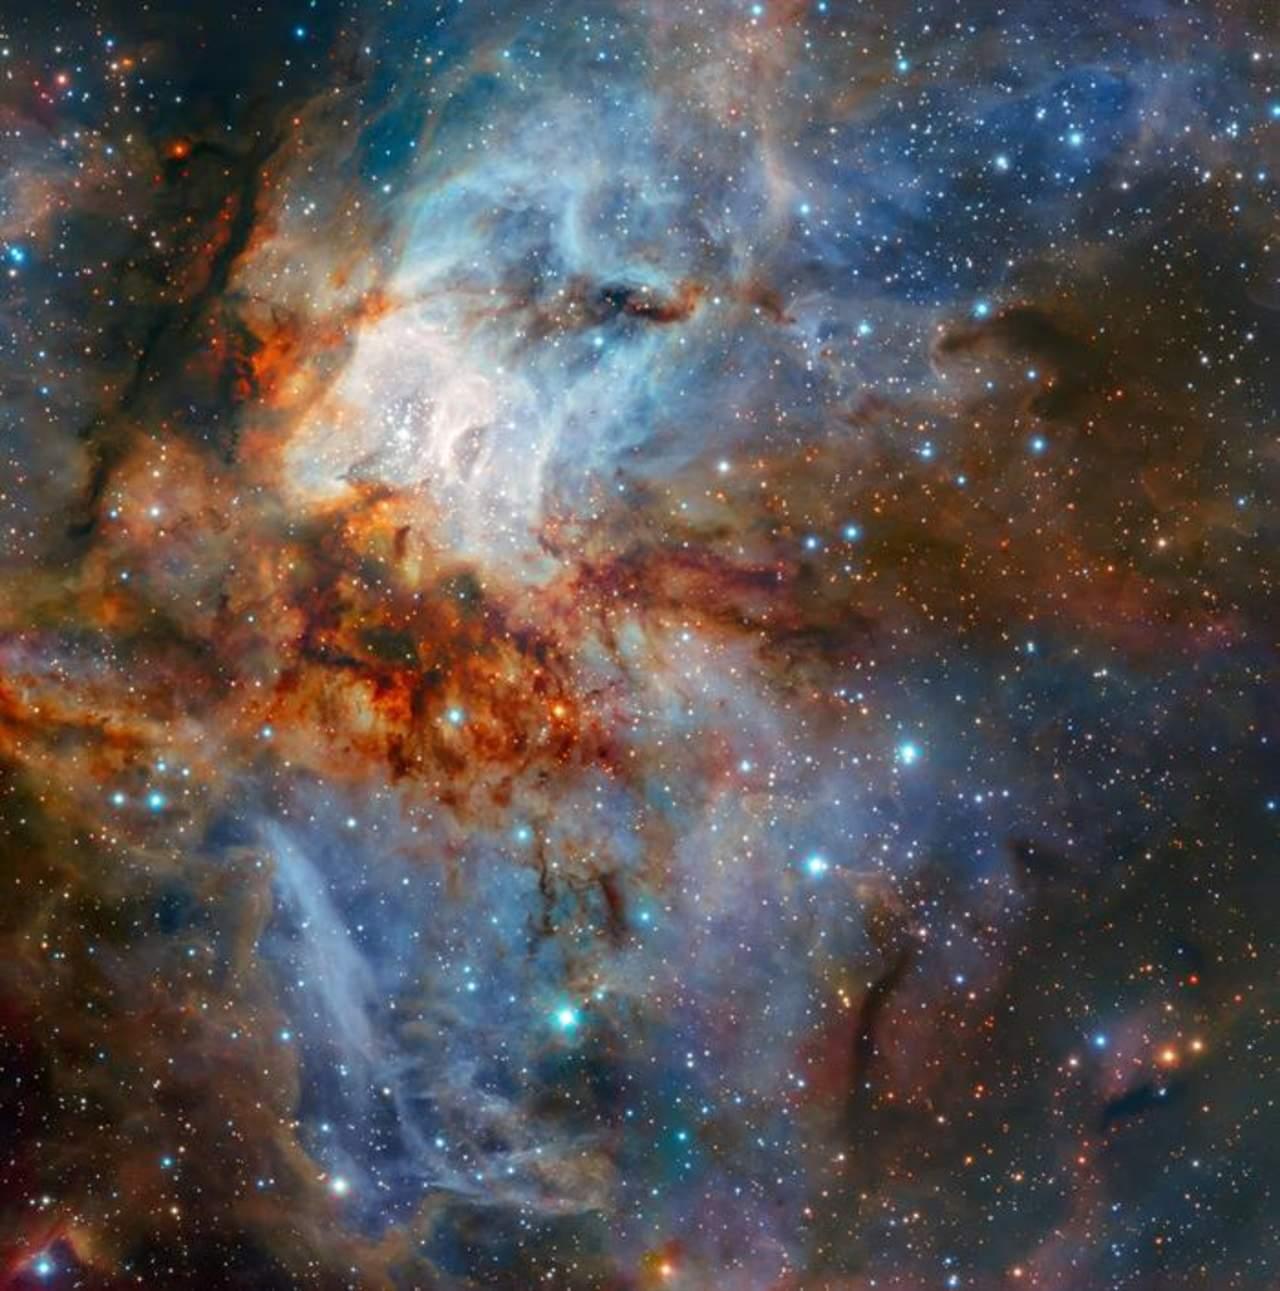 Captan imagen detallada del cúmulo estelar RCW 38